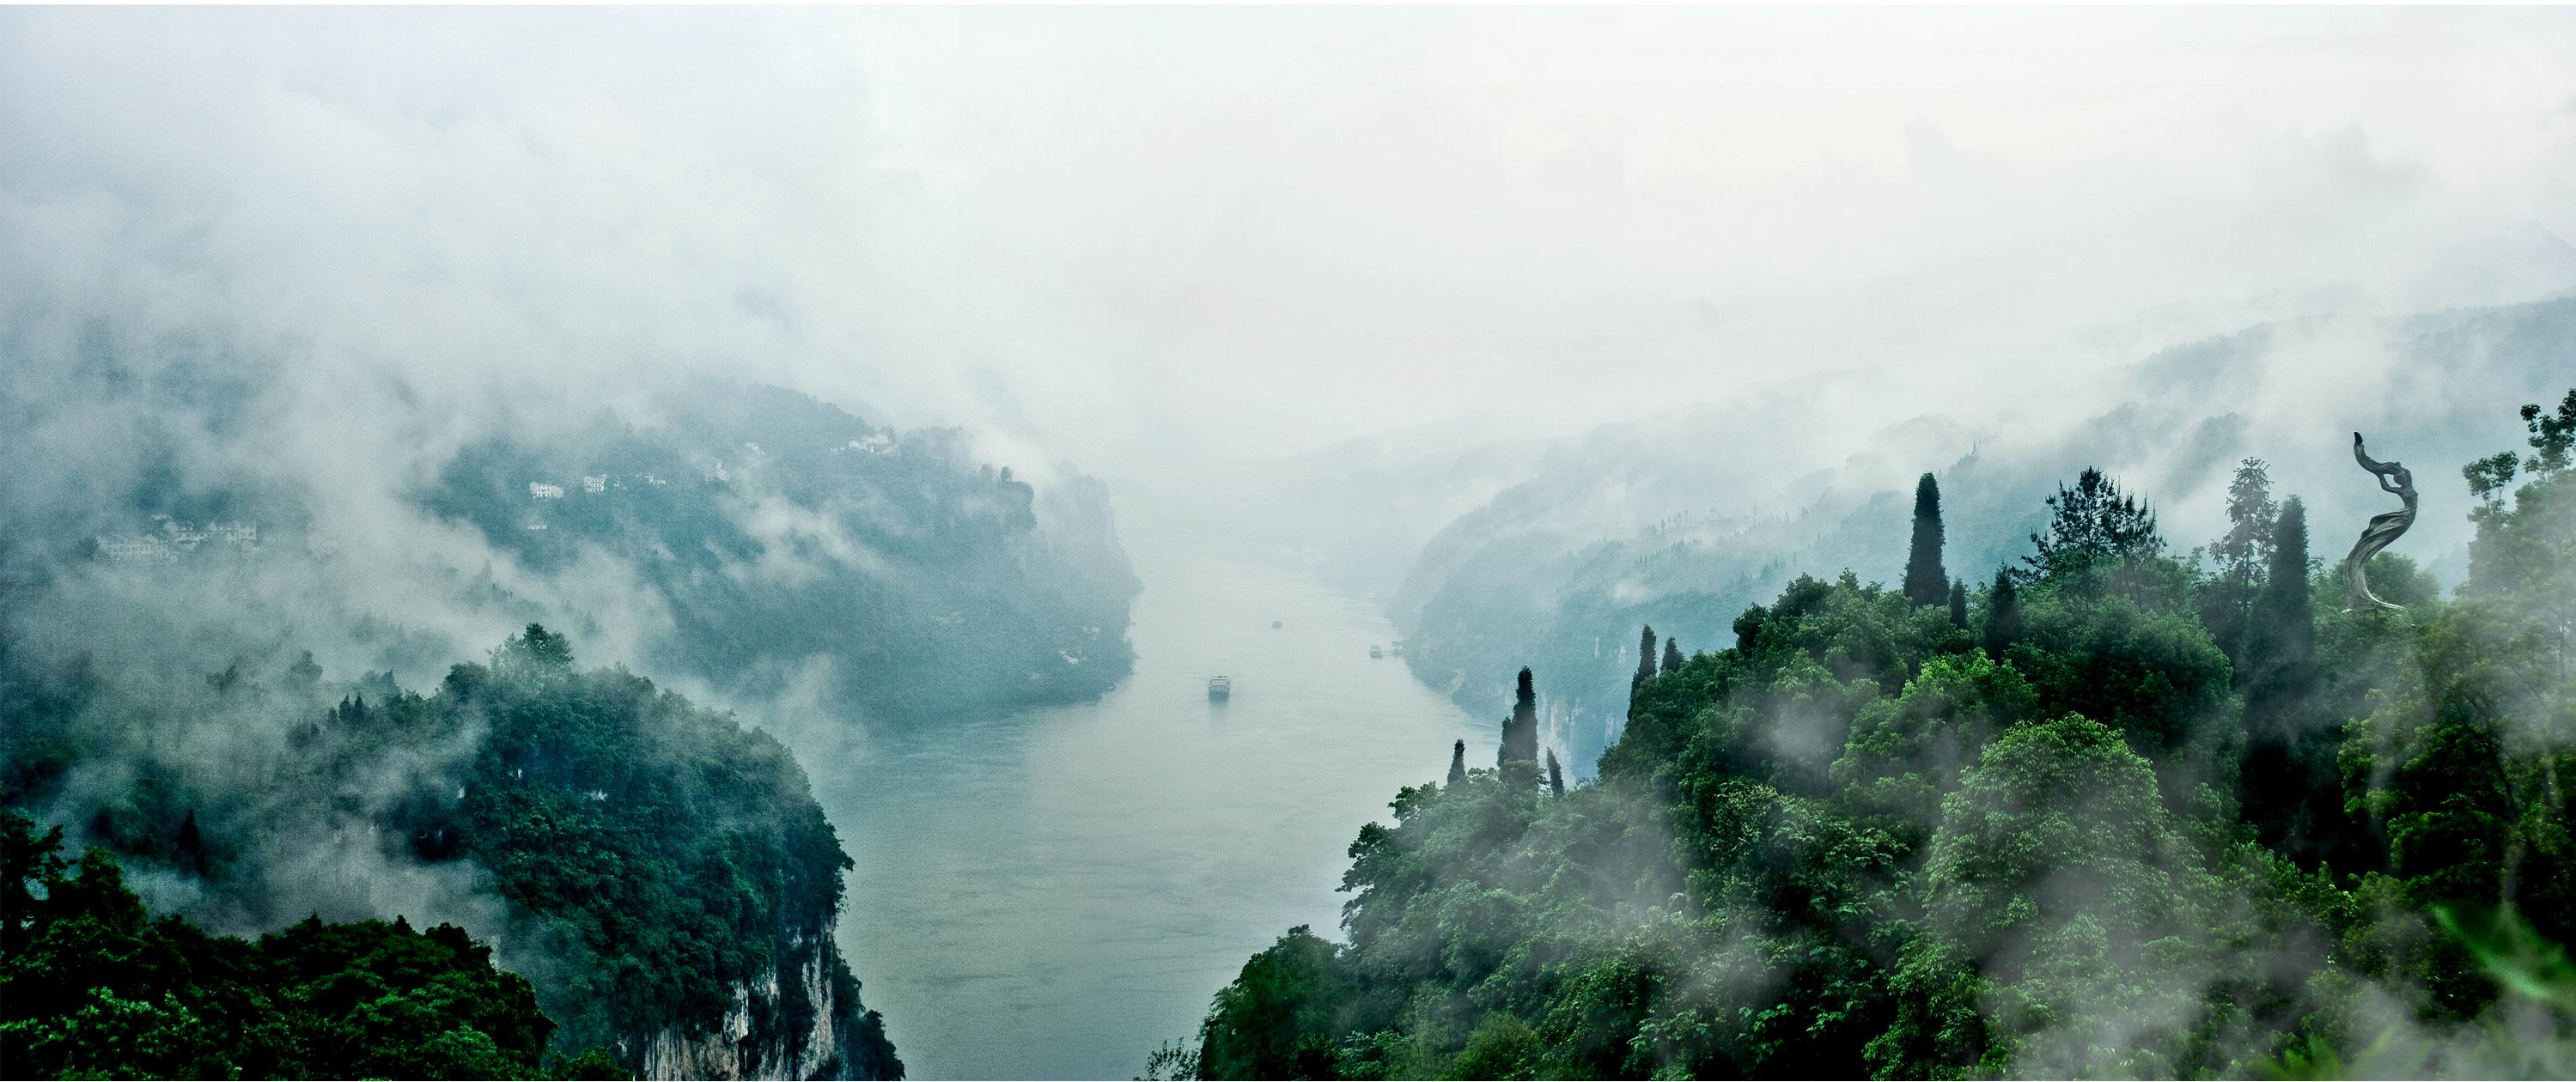 Misty Yangtze & Gorge